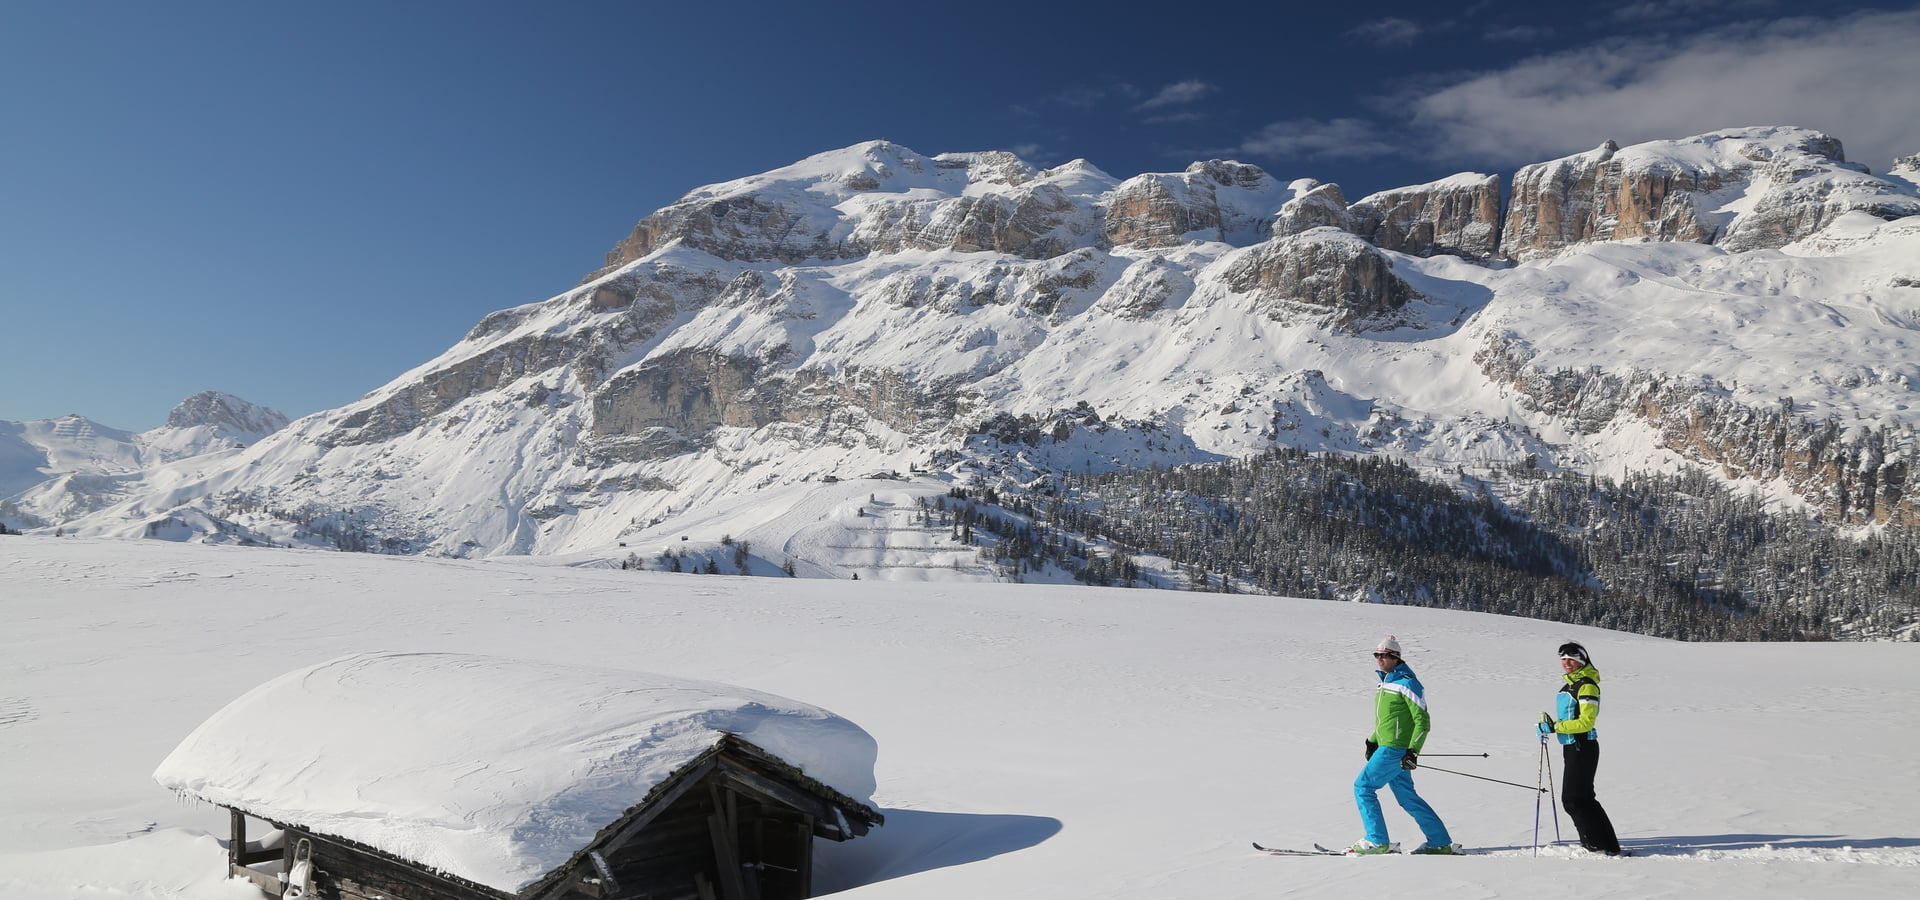 No-Stop Skiing until April 9th 2017 in Arabba-Marmoalda Skiarea